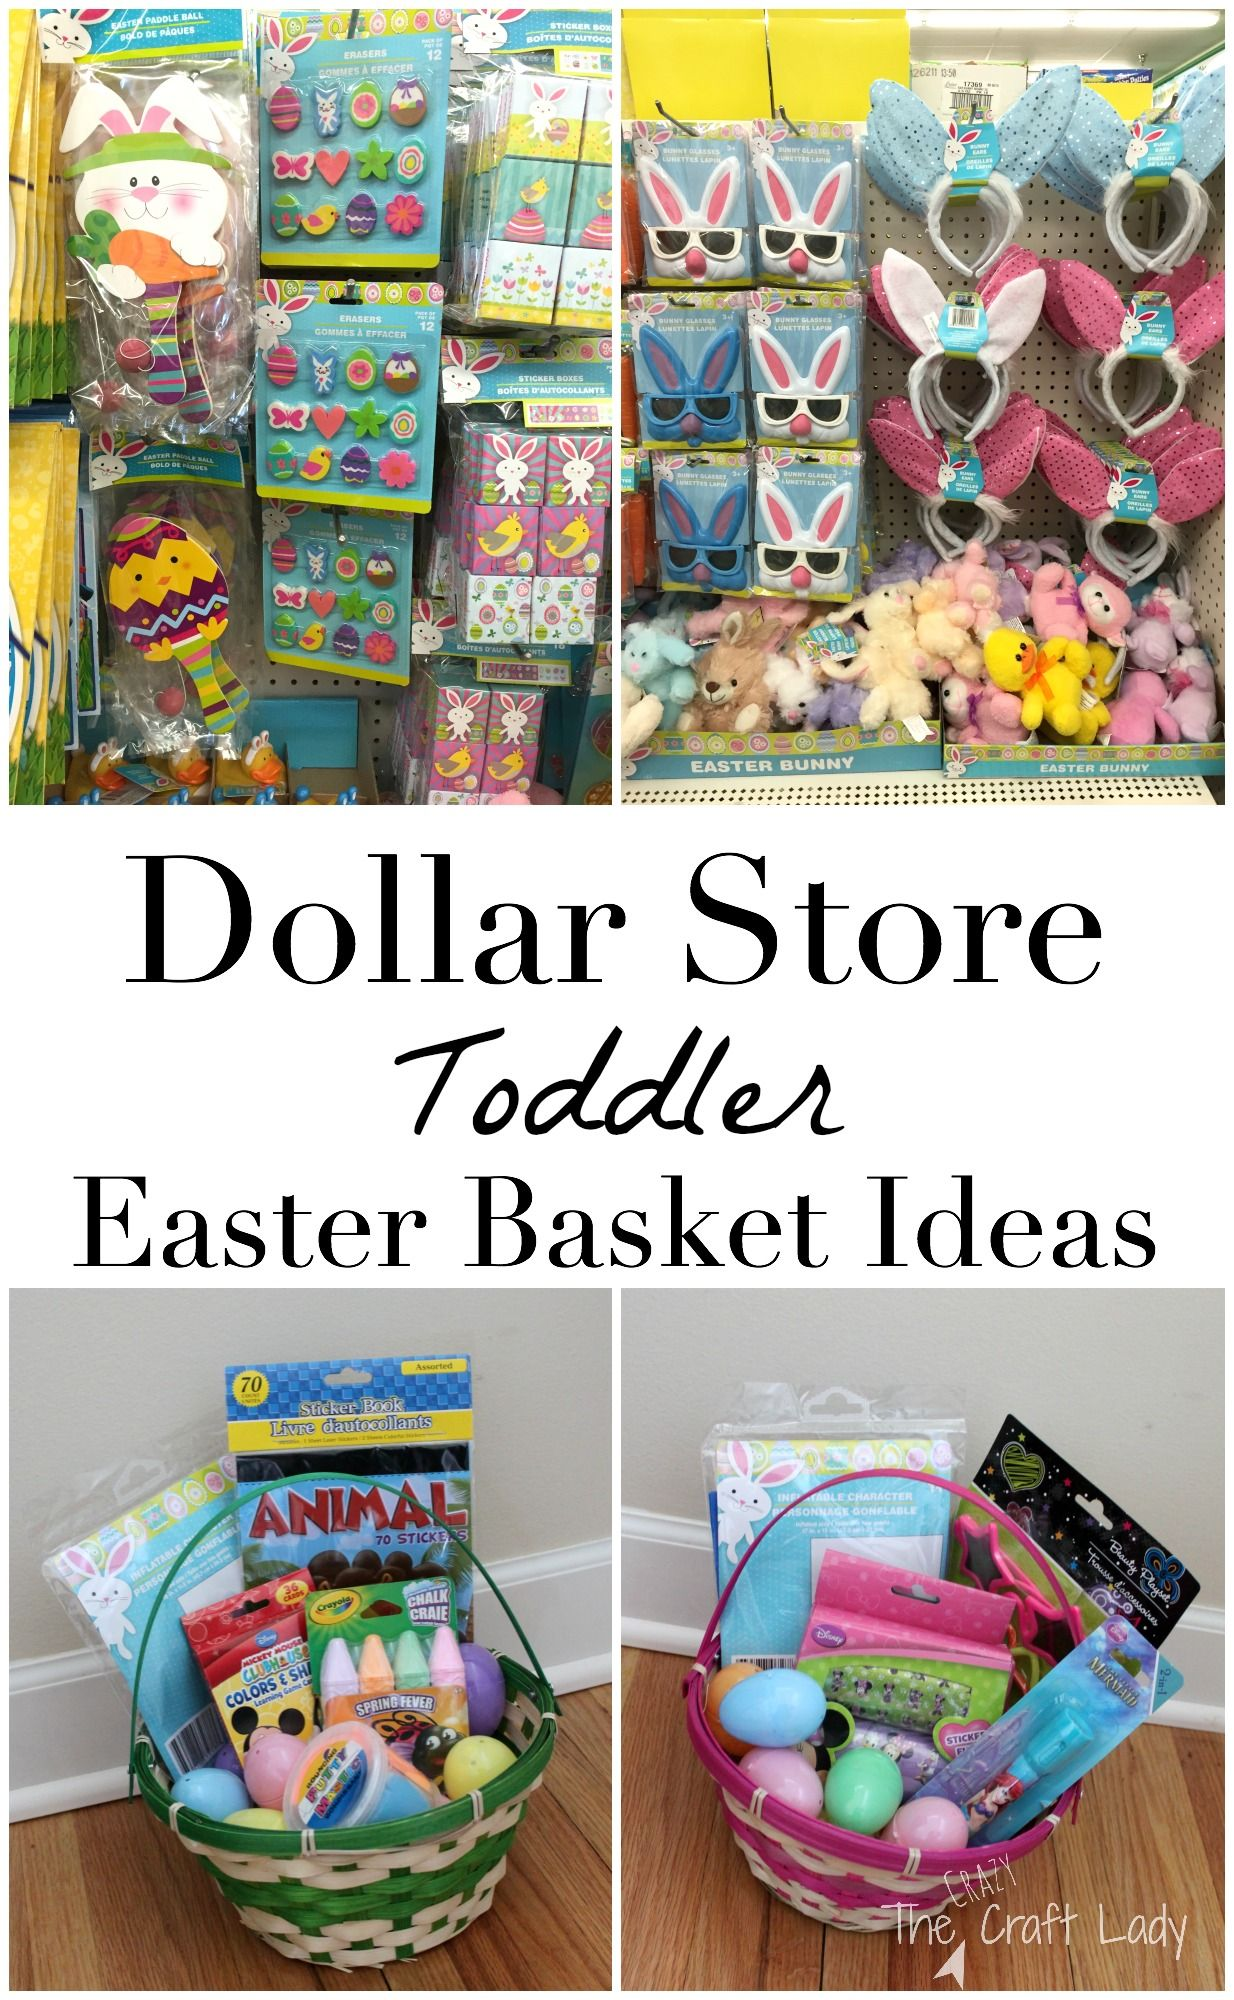 Toddler approved dollar store easter basket ideas basket ideas toddler approved dollar store easter basket ideas negle Gallery